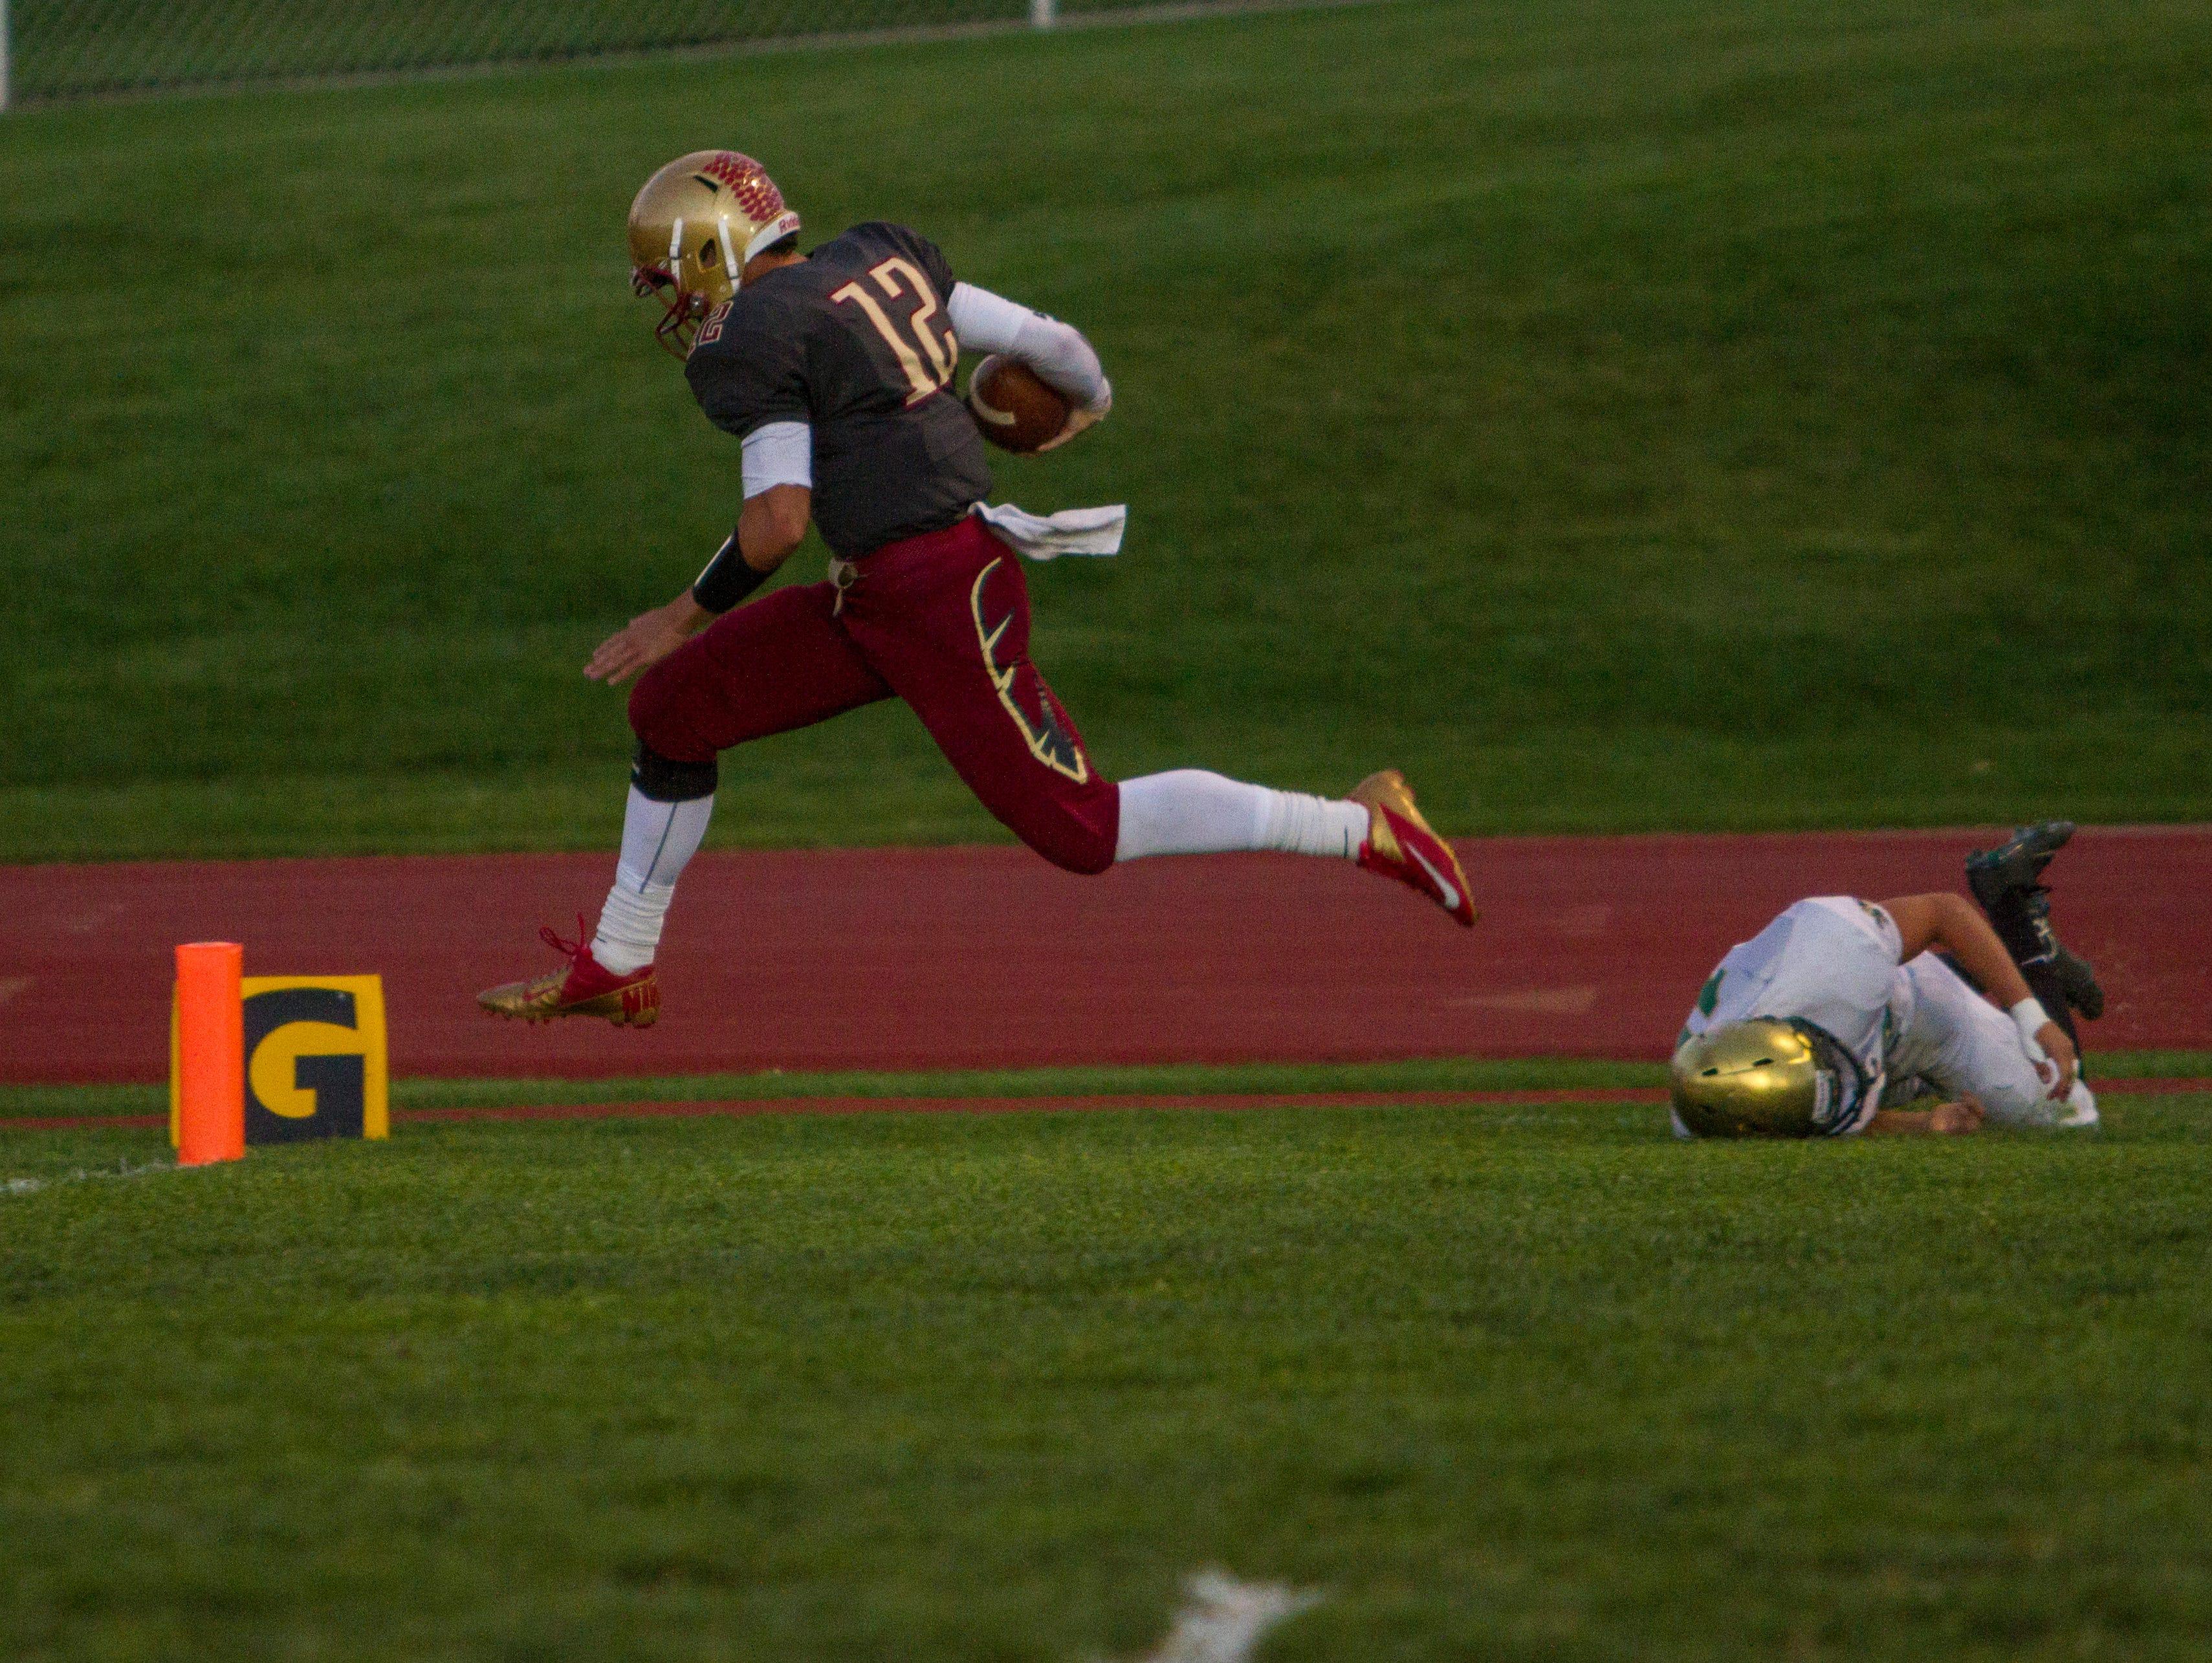 Cedar's Mason Fakahua (#12) runs for a touchdown against Snow Canyon, Friday, Sept. 25, 2015.